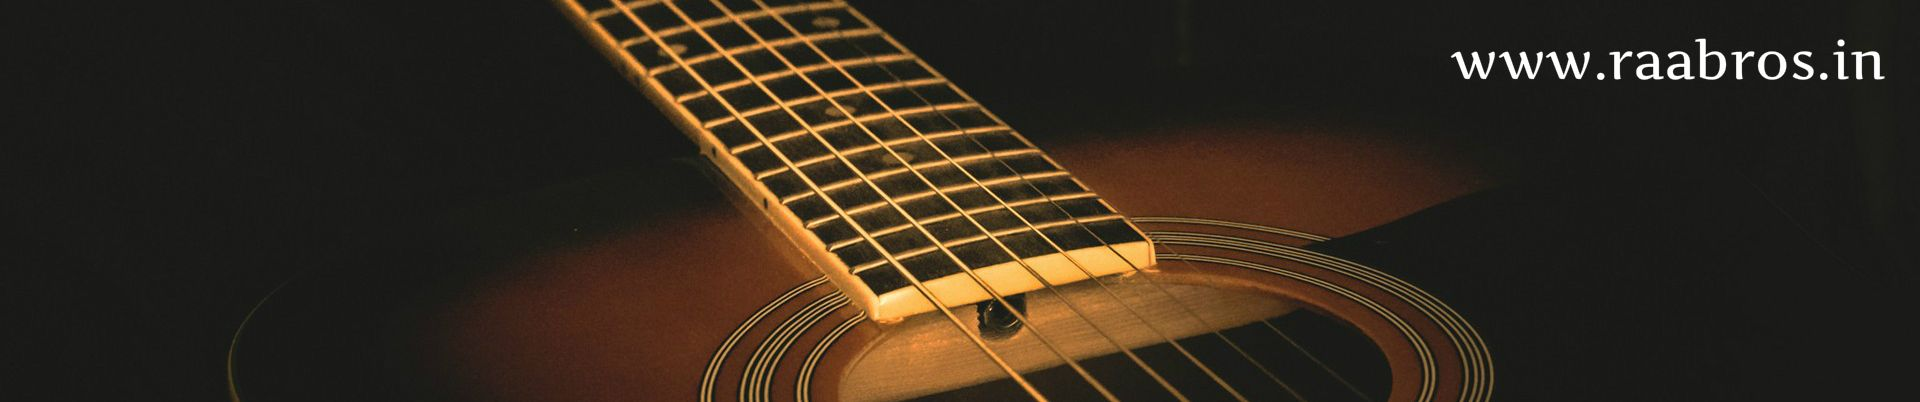 Meri Maa Dasvidaniya Guitar Cover By Raabros Happpy Mothers